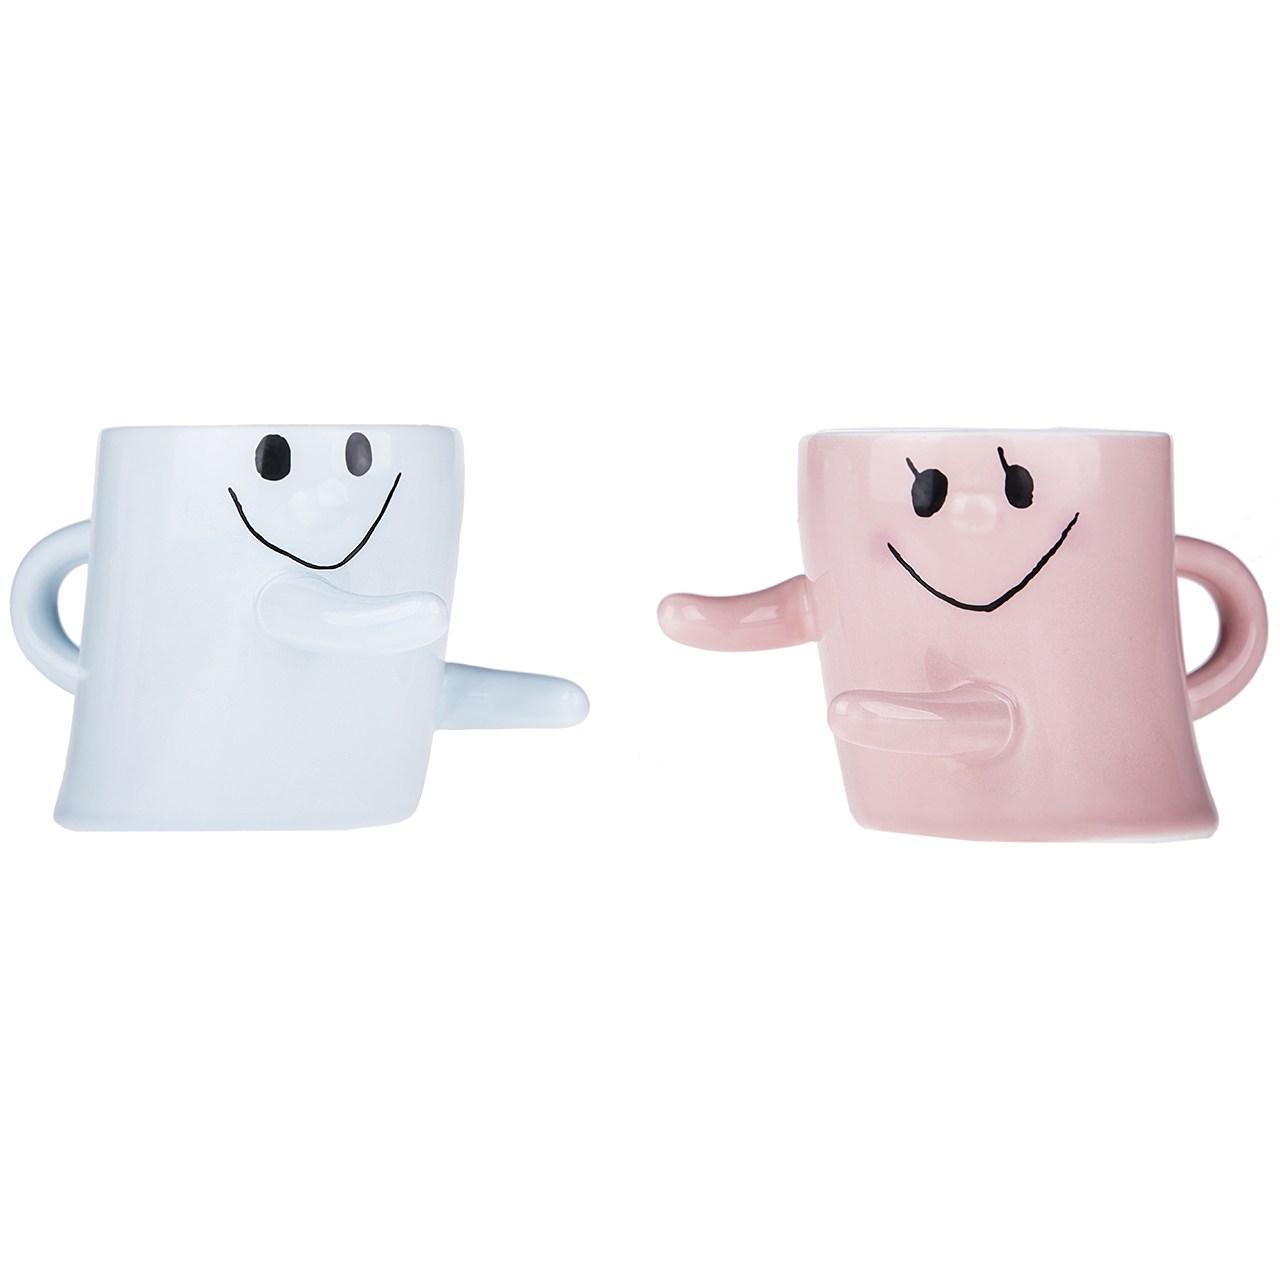 ماگ سرامیکی مدل Hug Me Mug